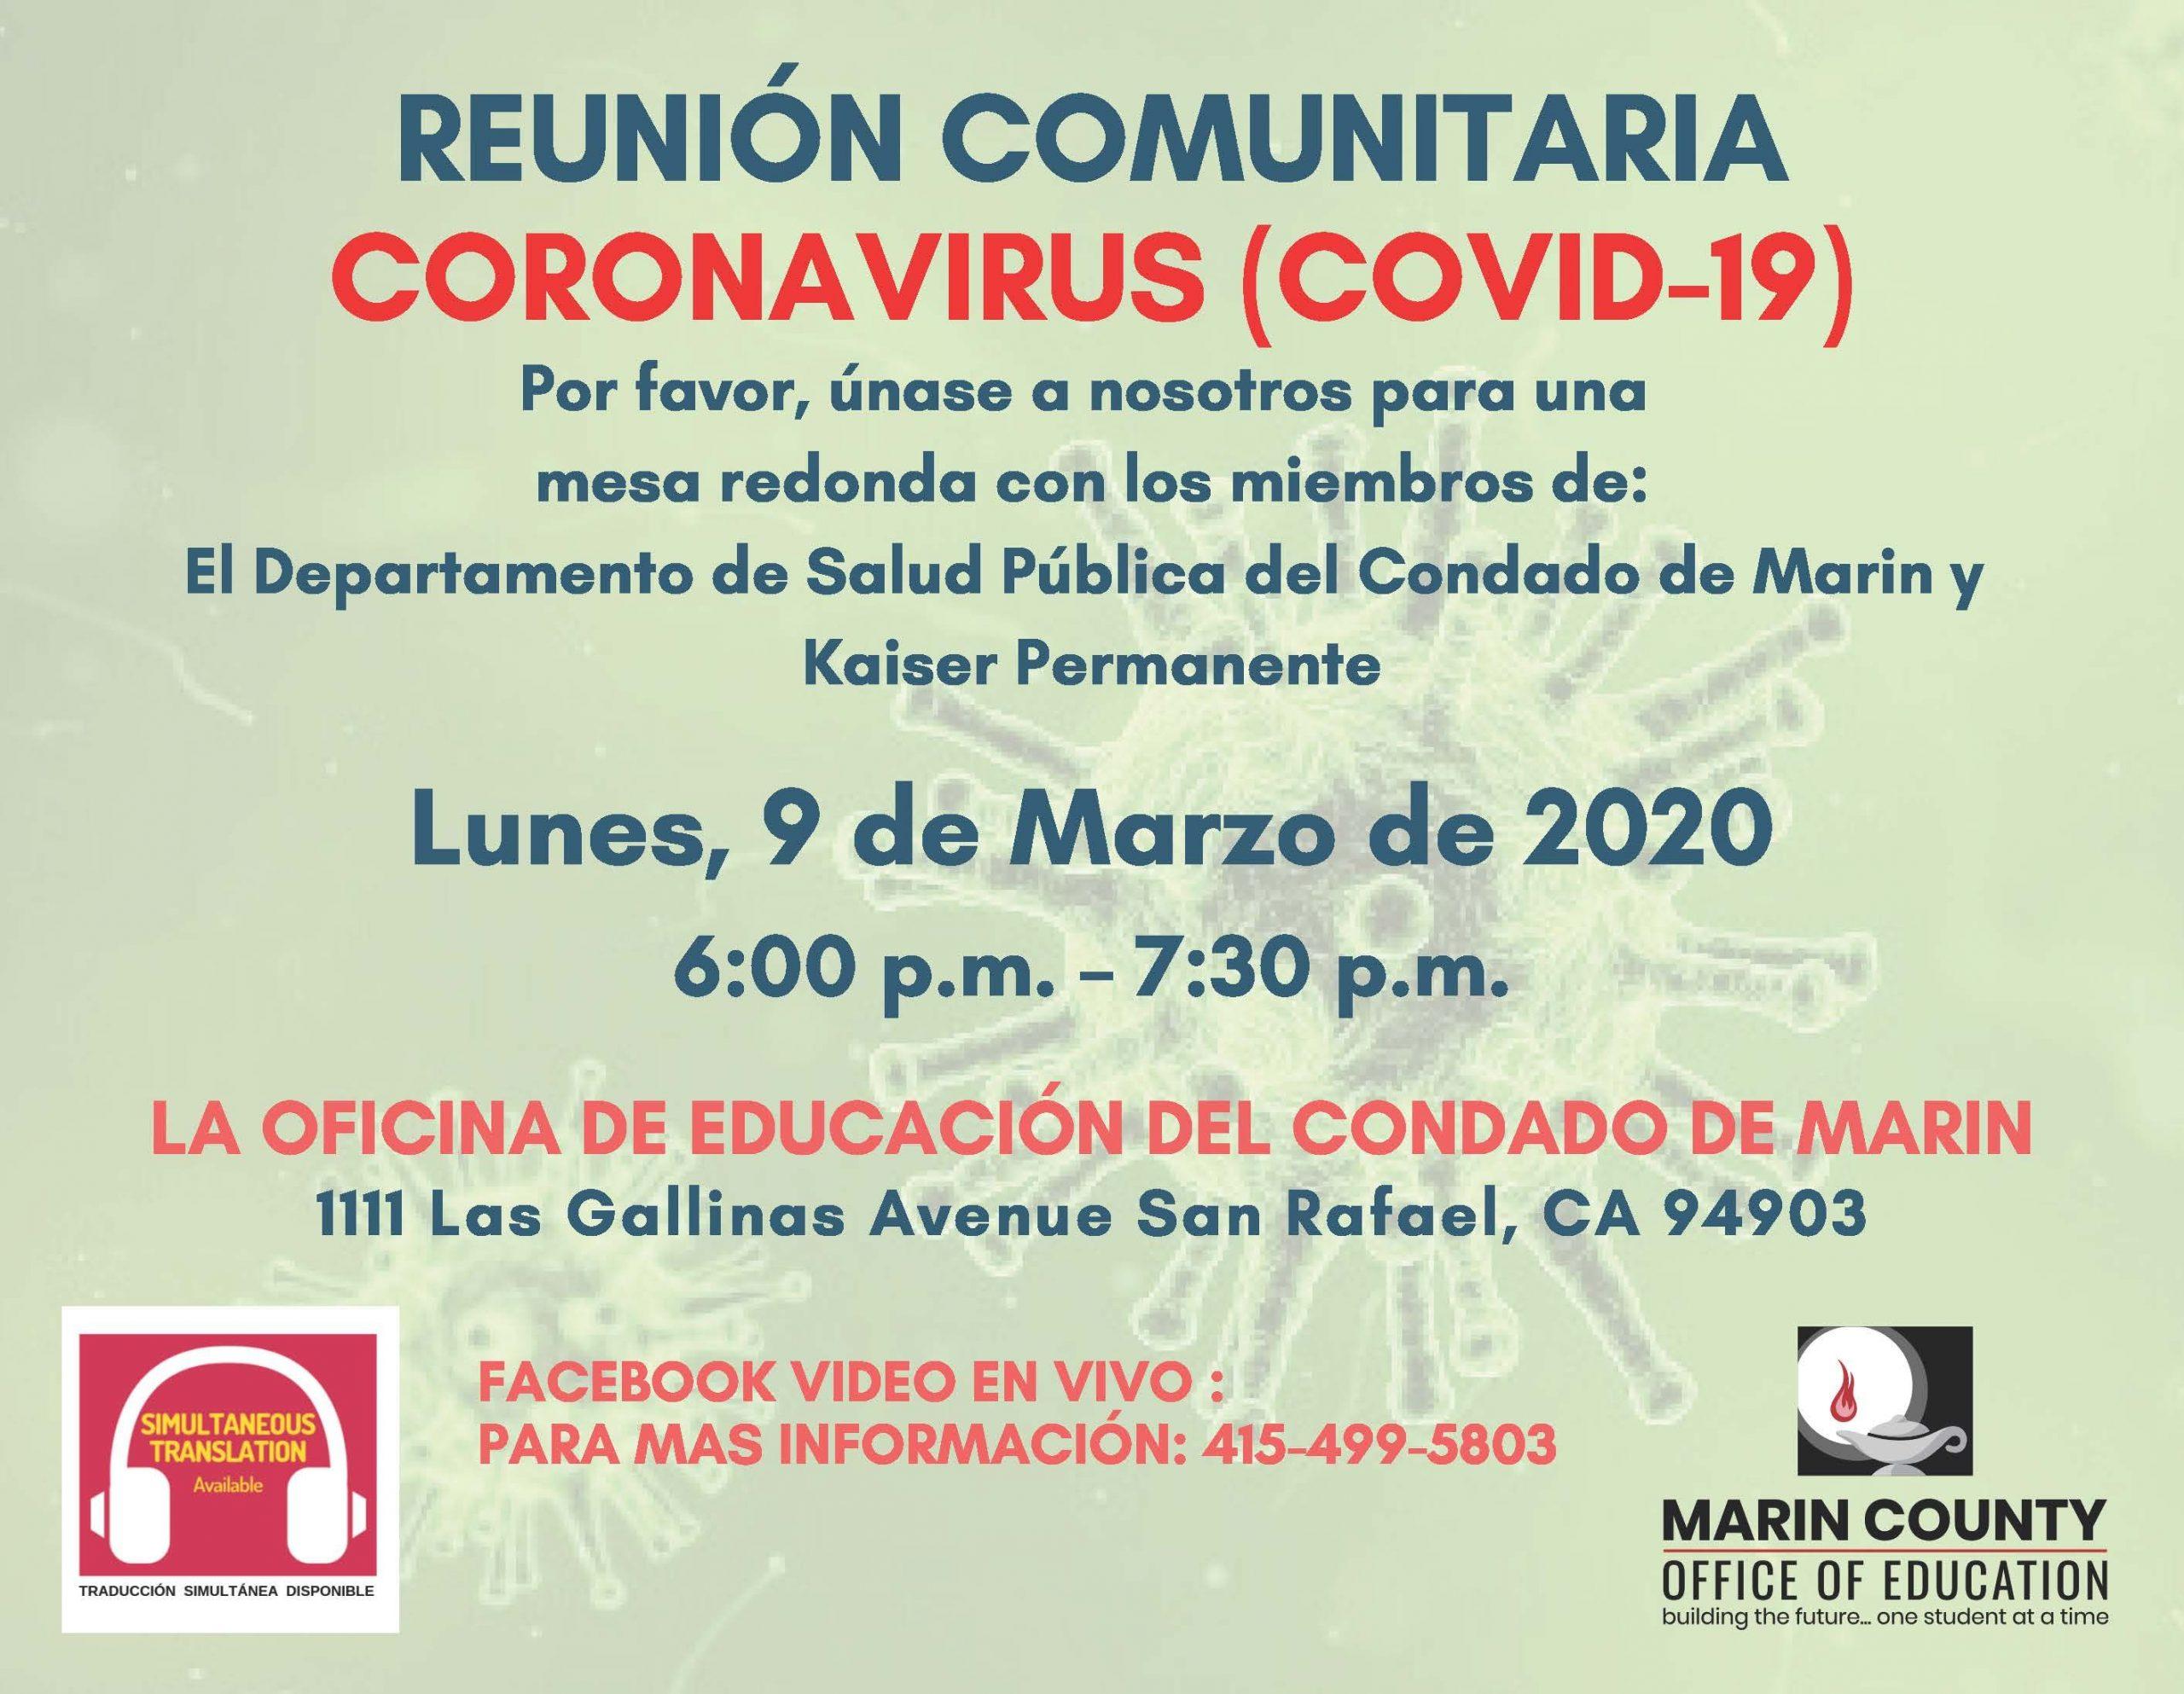 CommunityMeeting-03-09-2020 ESPANOLCommunityMeeting-03-09-2020 ESPANOLCommunityMeeting-03-09-2020 ESPANOLCommunityMeeting-03-09-2020 ESPANOLCommunityMeeting-03-09-2020 ESPANOLCommunityMeeting-03-09-2020 ESPANOLCommunityMeeting-03-09-2020 ESPANOLCommunityMeeting-03-09-2020 ESPANOLCommunityMeeting-03-09-2020 ESPANOLCommunityMeeting-03-09-2020 ESPANOLCommunityMeeting-03-09-2020 ESPANOLCommunityMeeting-03-09-2020 ESPANOLCommunityMeeting-03-09-2020 ESPANOLCommunityMeeting-03-09-2020 ESPANOLCommunityMeeting-03-09-2020 ESPANOLCommunityMeeting-03-09-2020 ESPANOLCommunityMeeting-03-09-2020 ESPANOLCommunityMeeting-03-09-2020 ESPANOLCommunityMeeting-03-09-2020 ESPANOLCommunityMeeting-03-09-2020 ESPANOL